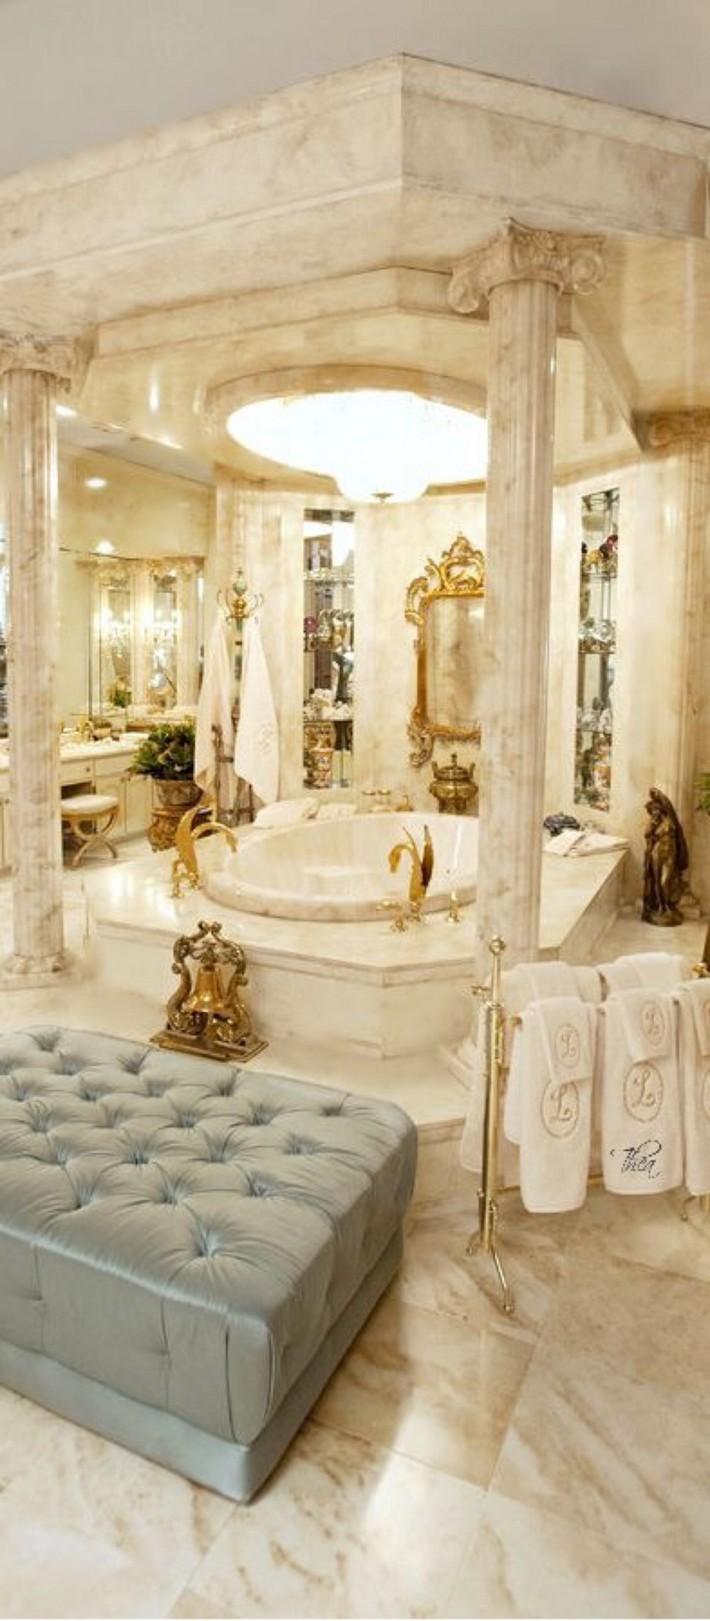 extra luxury bathrooms ideas maison valentina11 luxury bathrooms 40 Extra Luxury Bathrooms Ideas that Will Blow Your Mind extra luxury bathrooms ideas maison valentina11